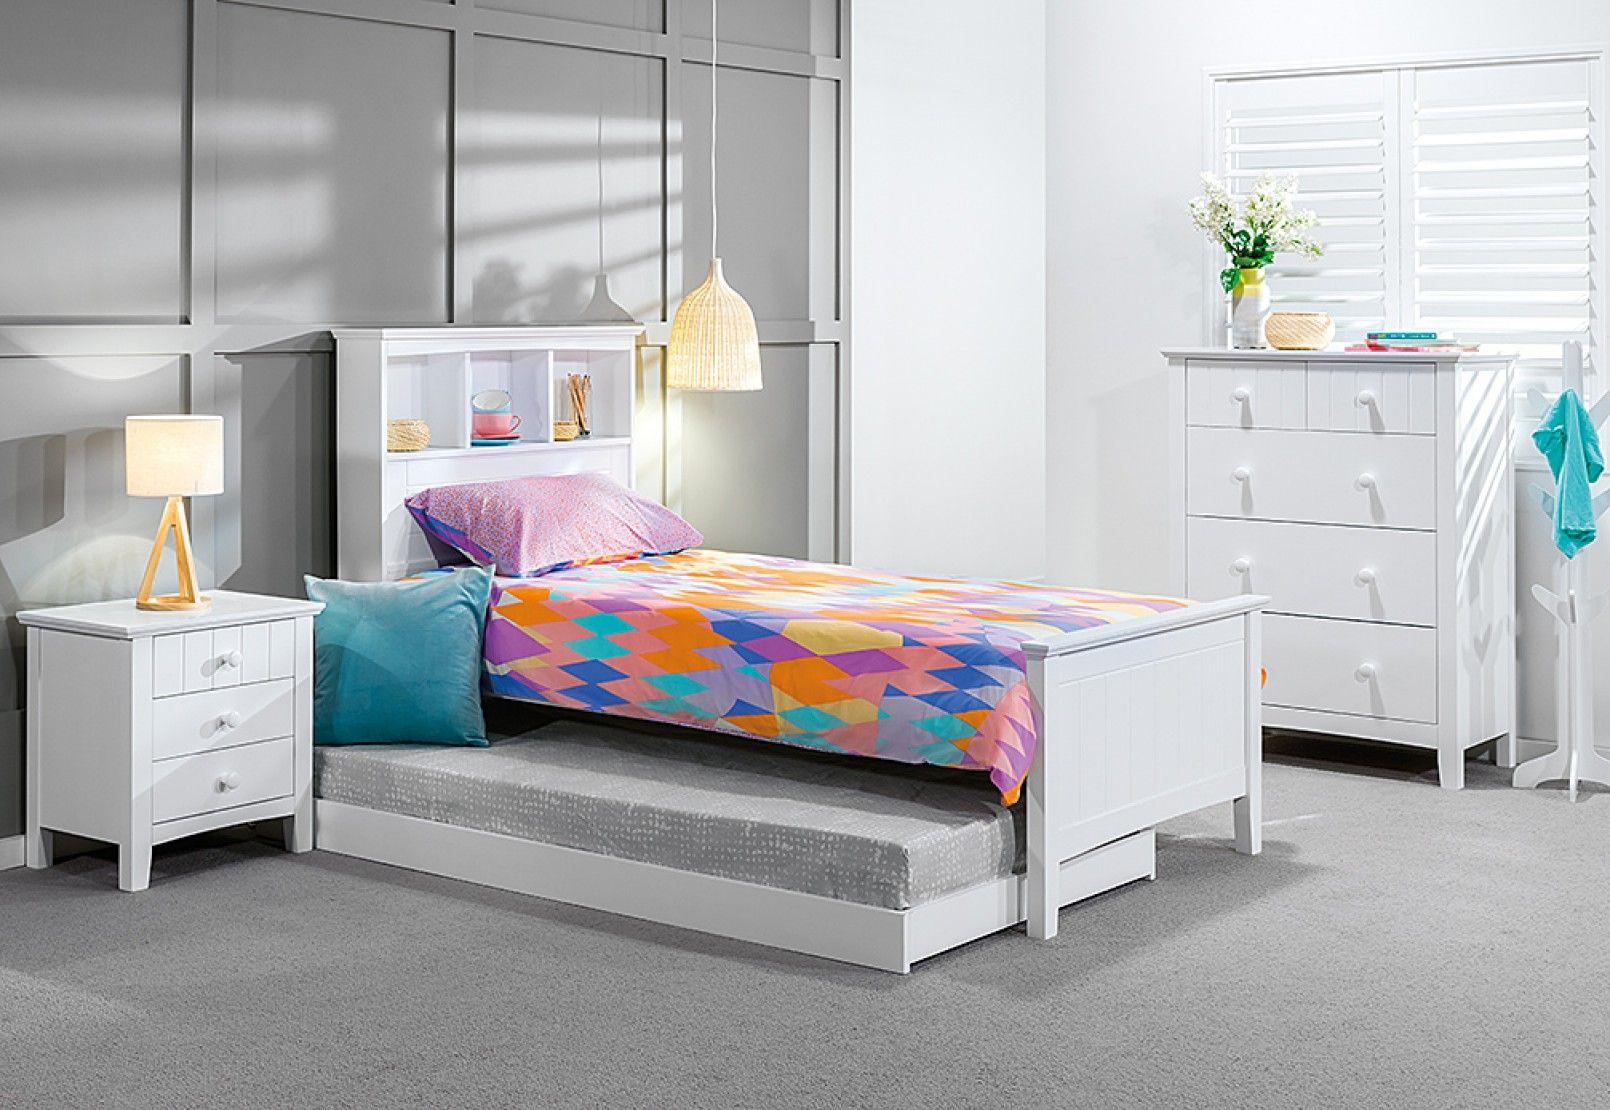 Best Addison Bedroom Furniture Packages Home Decor Online 400 x 300